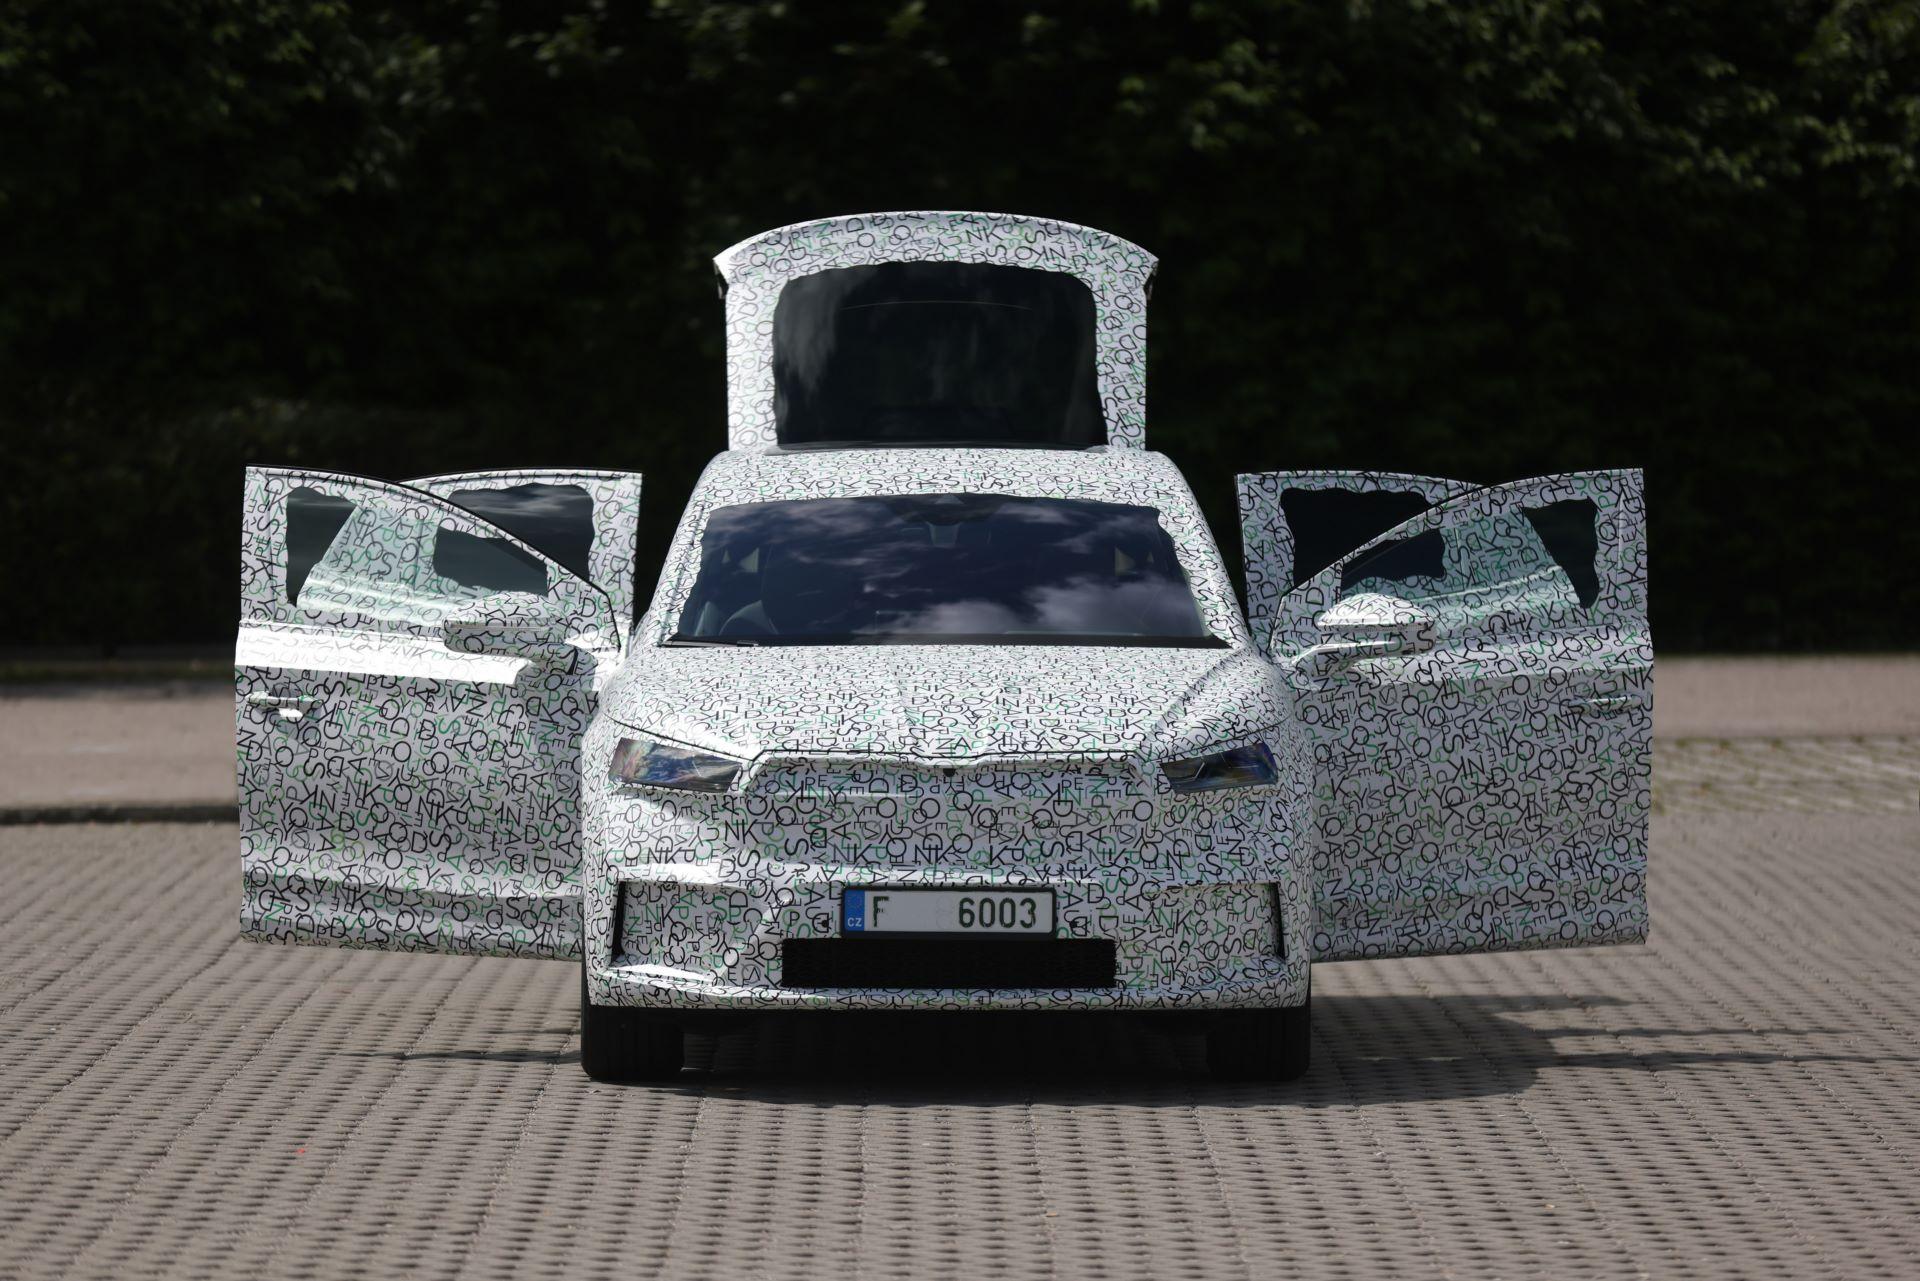 Skoda-Enyaq-Coupe-iV-specs-25